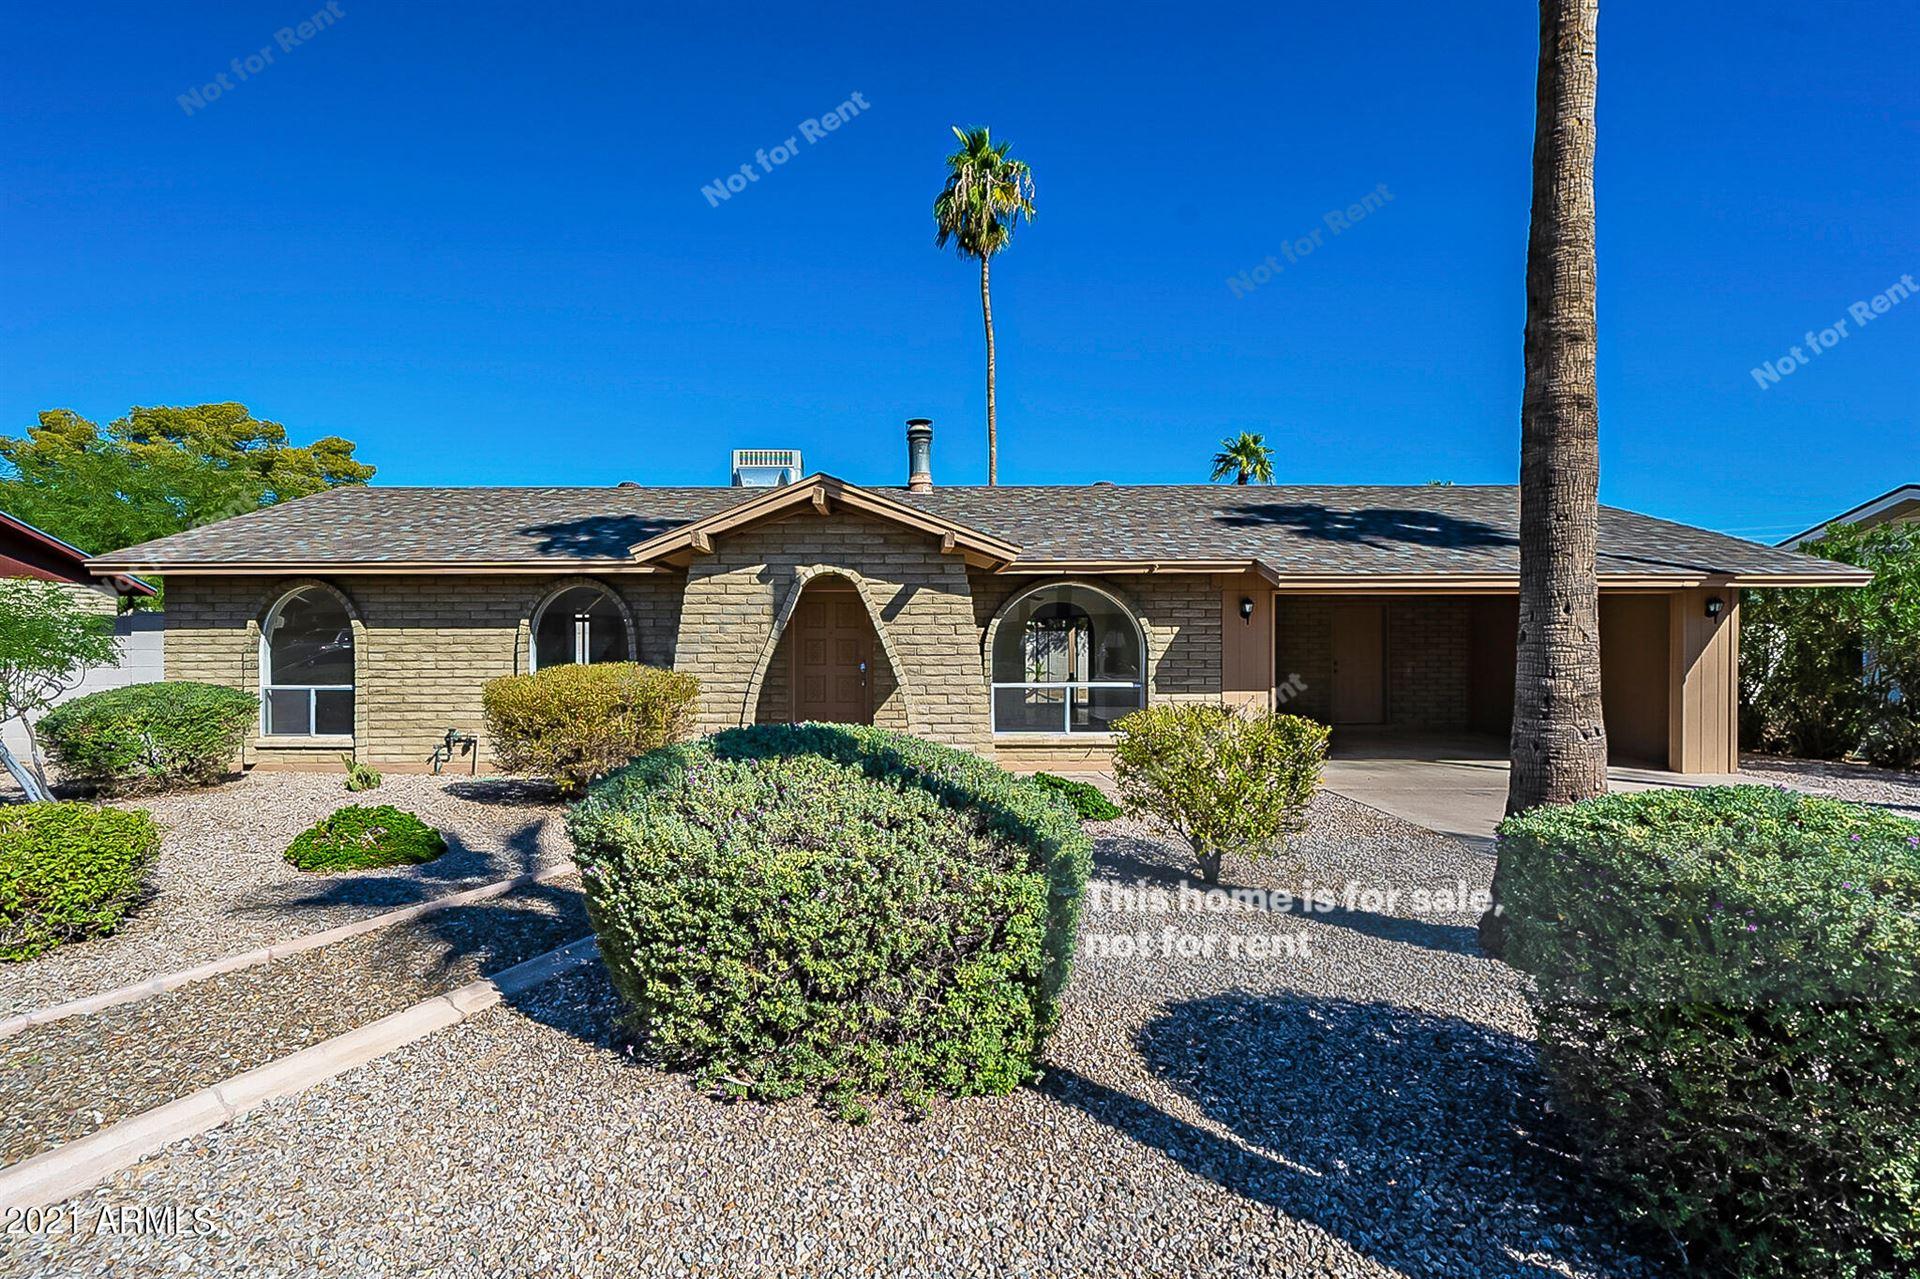 2814 E DAHLIA Drive, Phoenix, AZ 85032 - MLS#: 6309174